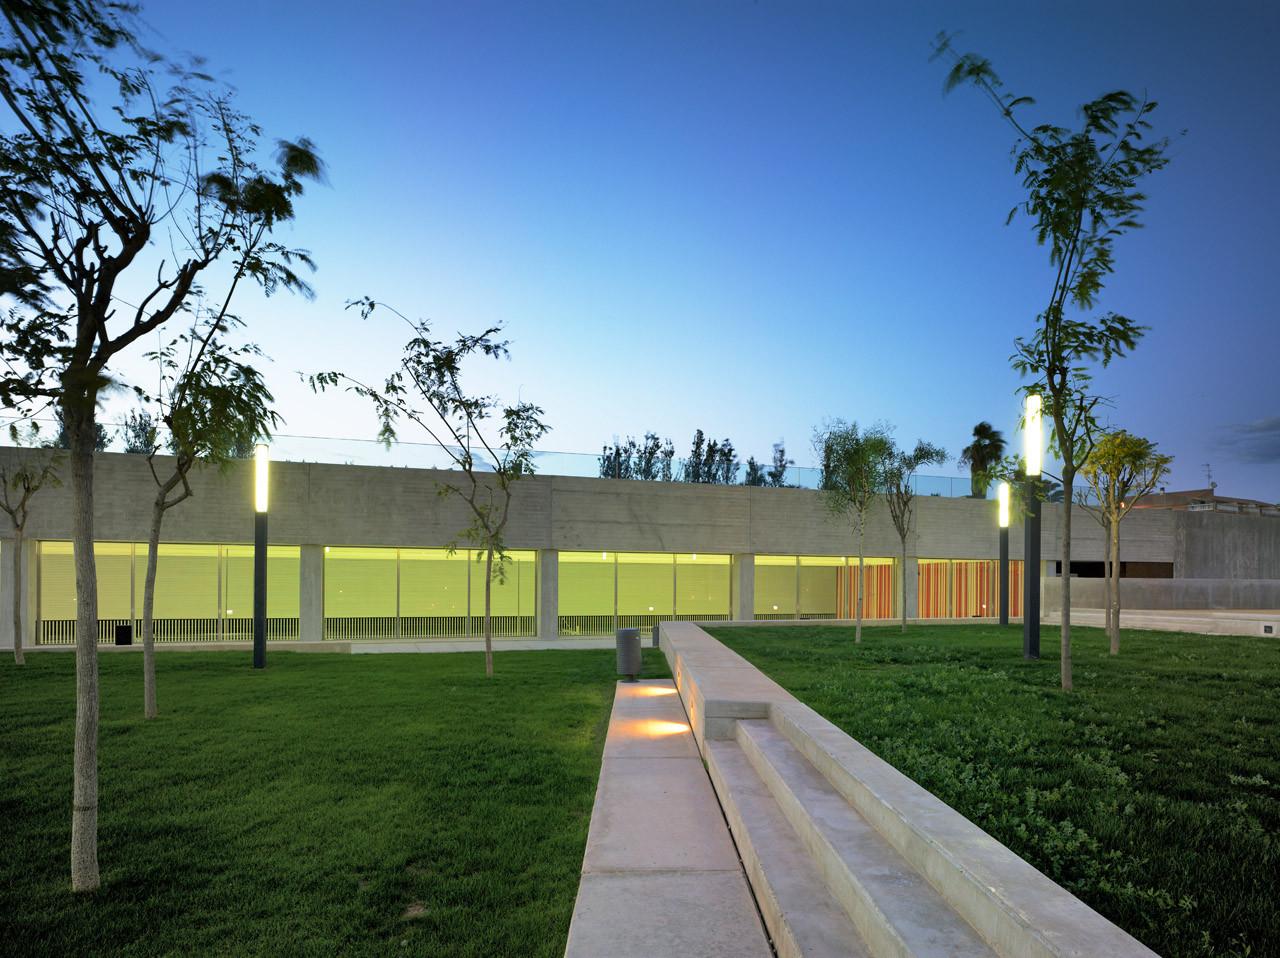 Palmaret-Alboraya Train Station / Rstudio, © David Frutos